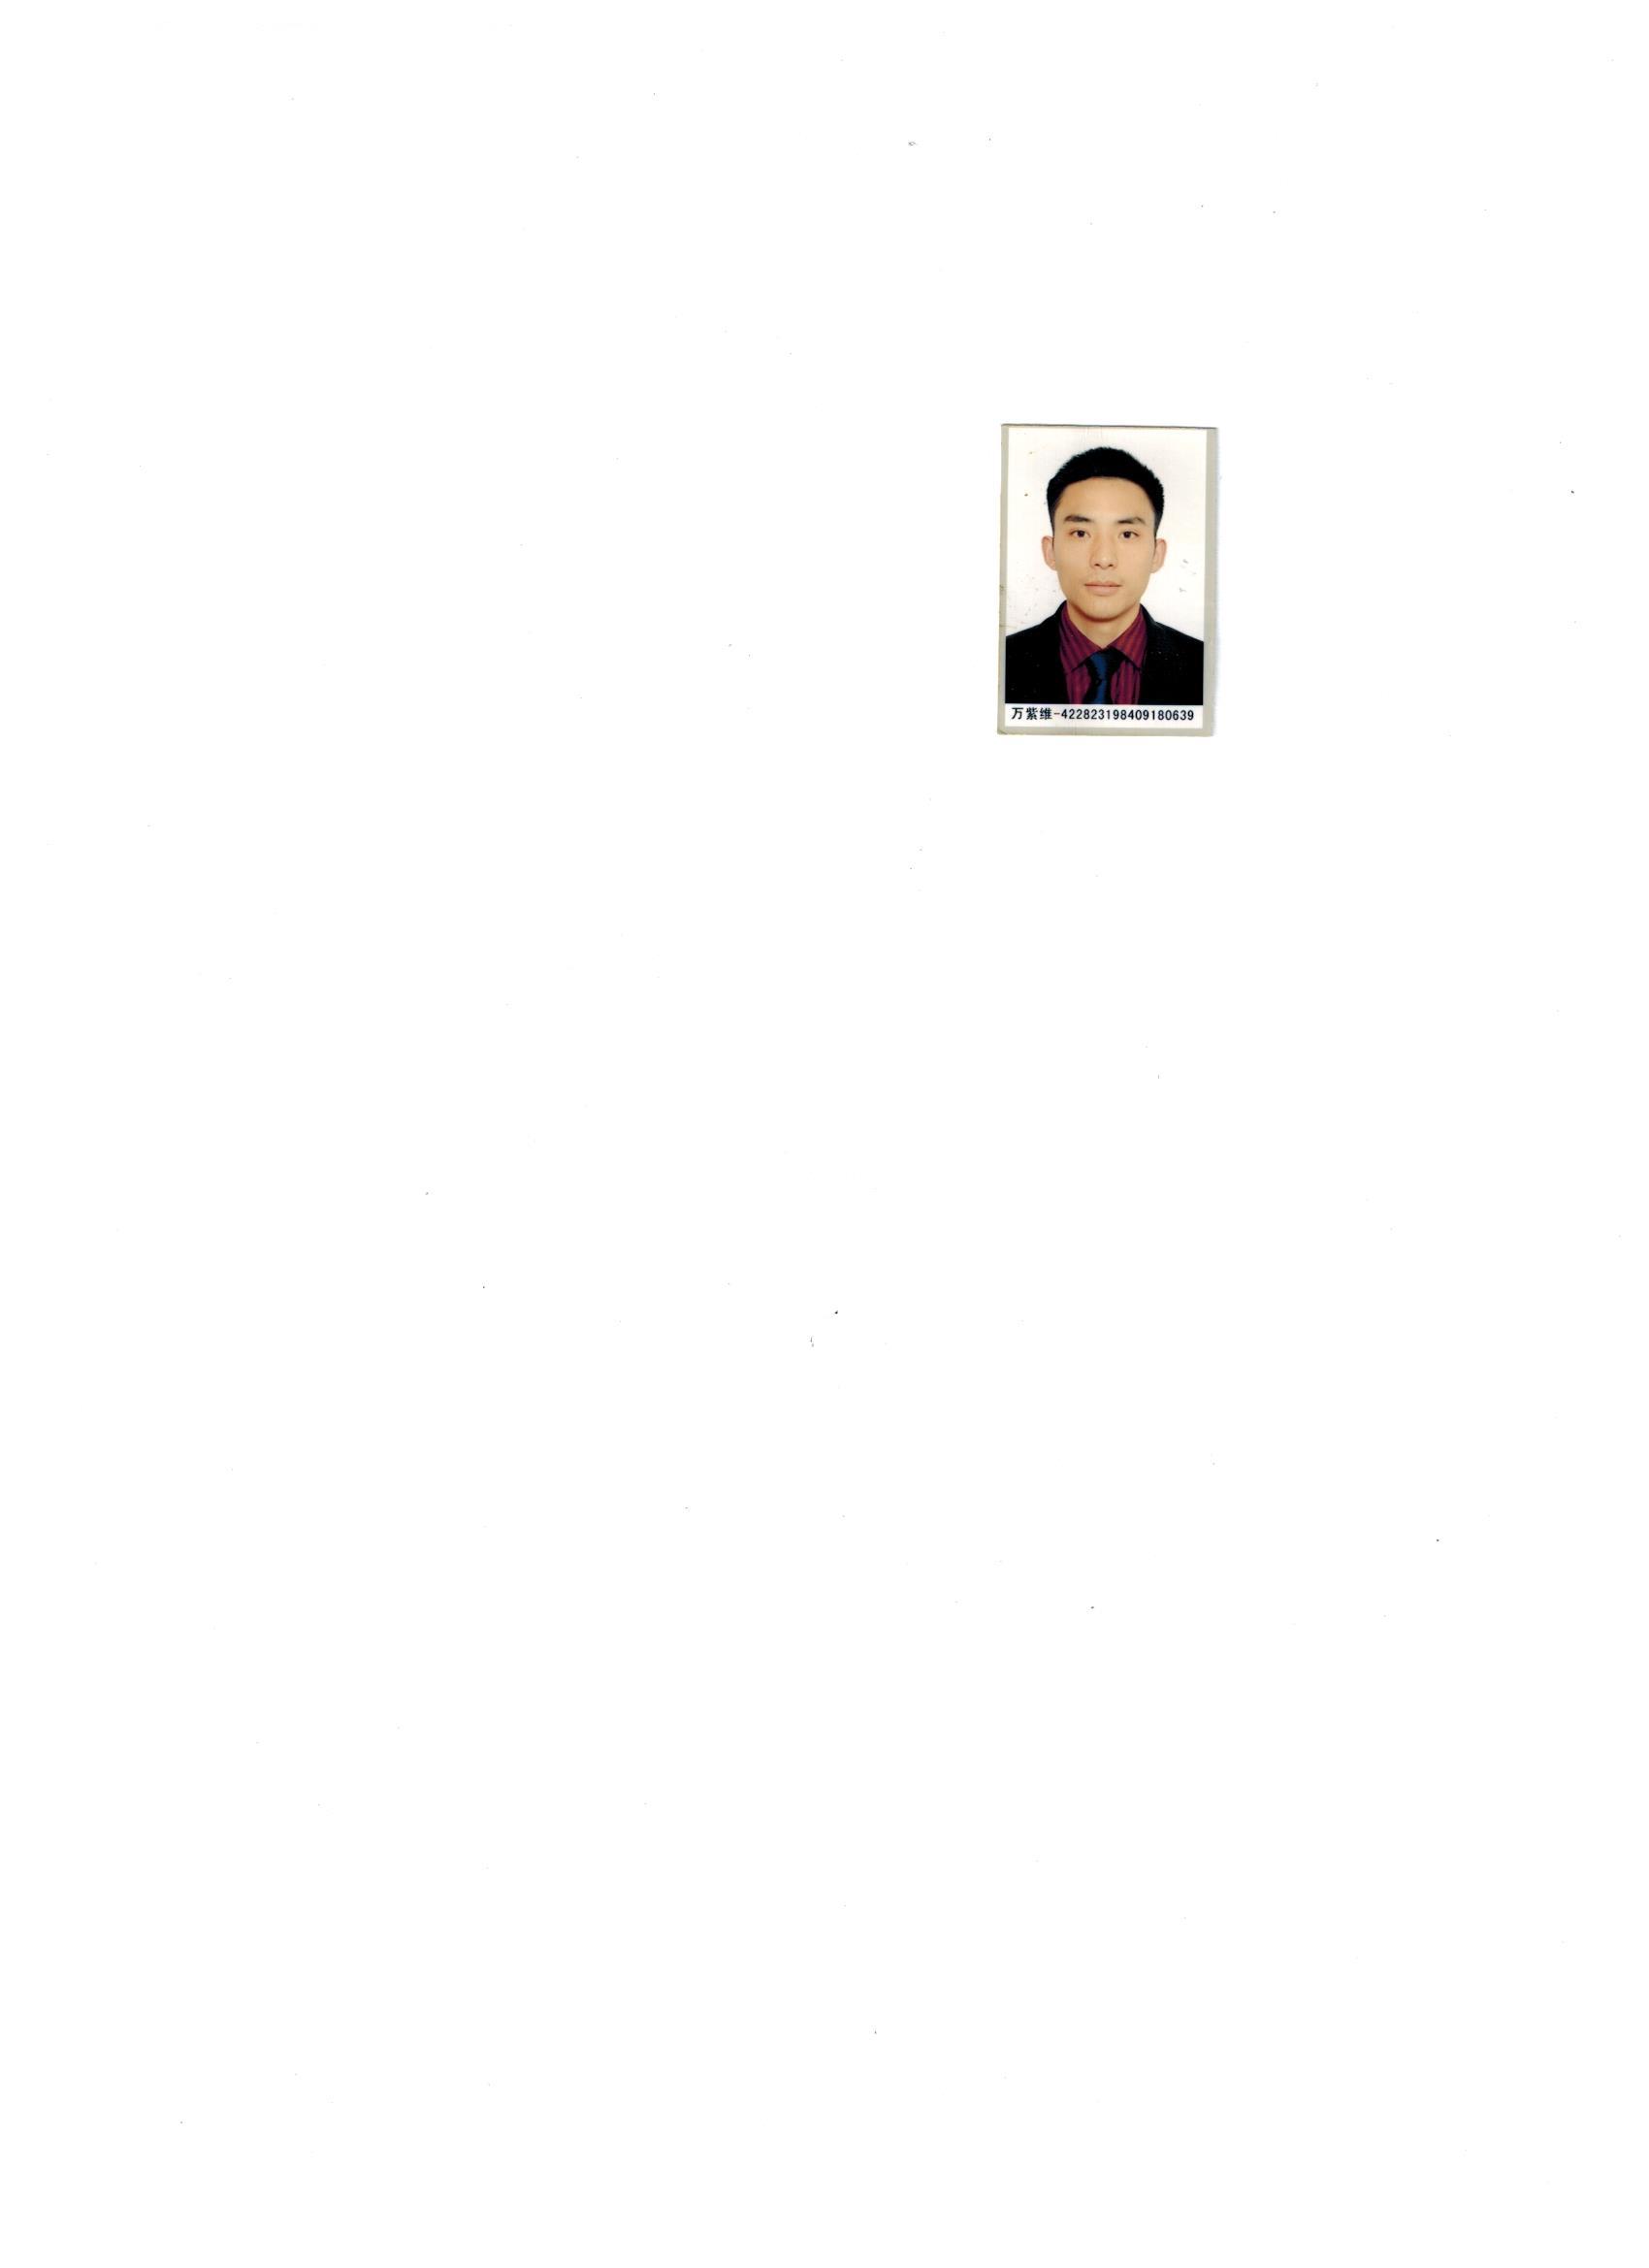 ppt 背景 背景图片 边框 模板 设计 相框 1700_2338 竖版 竖屏